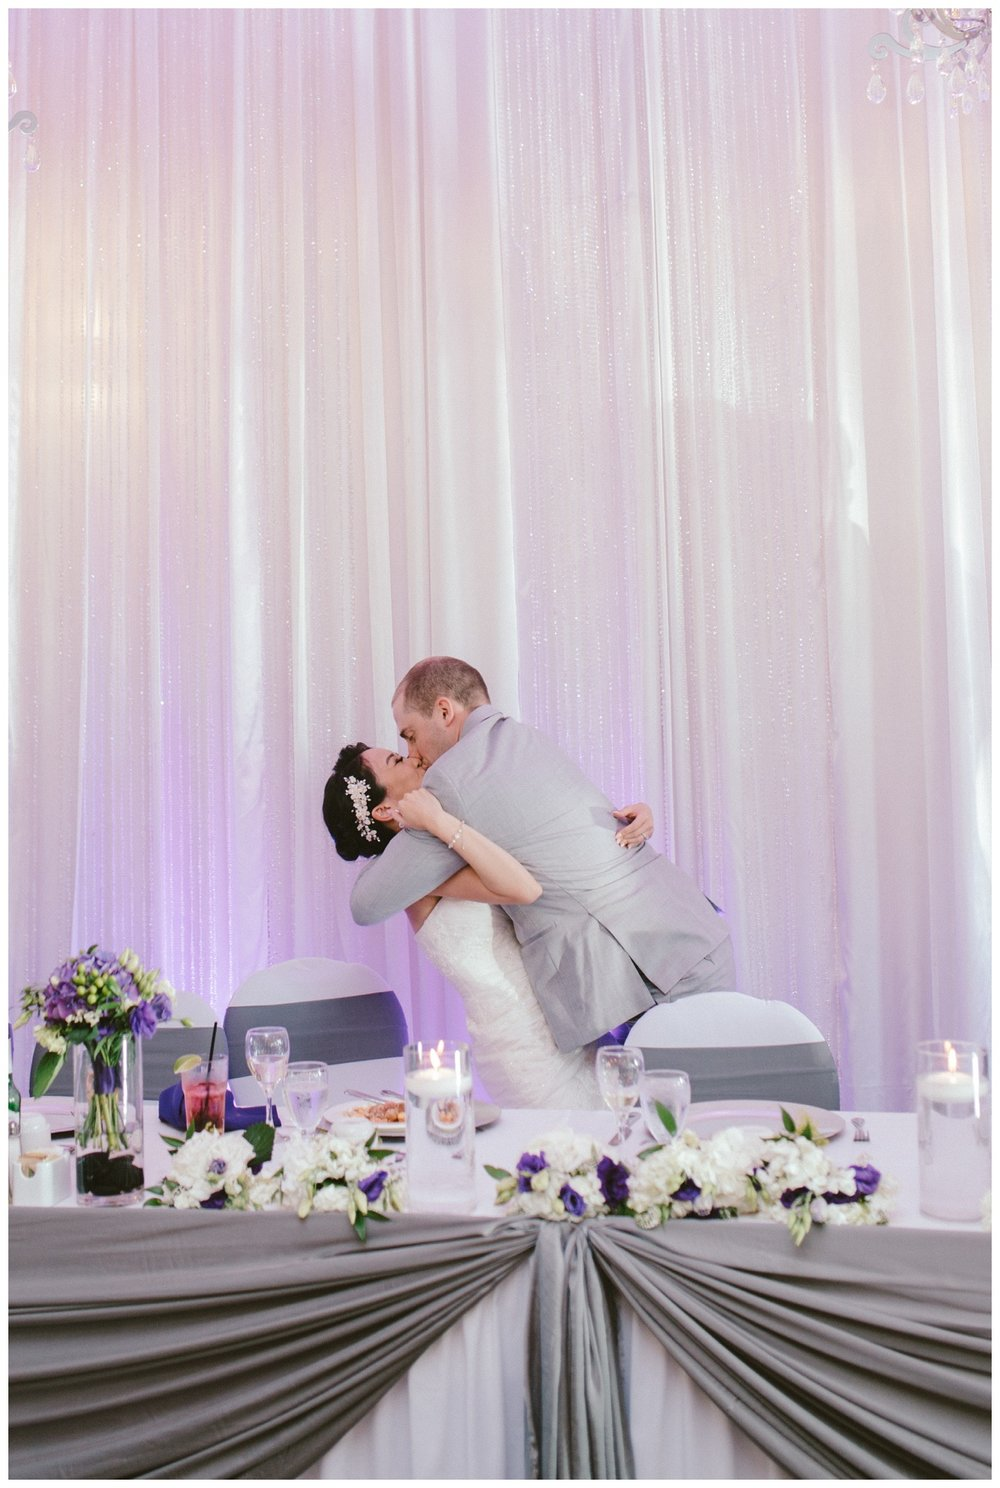 Mattie C. Fine Art Wedding Prewedding Photography Vancouver and Hong Kong 118.jpg